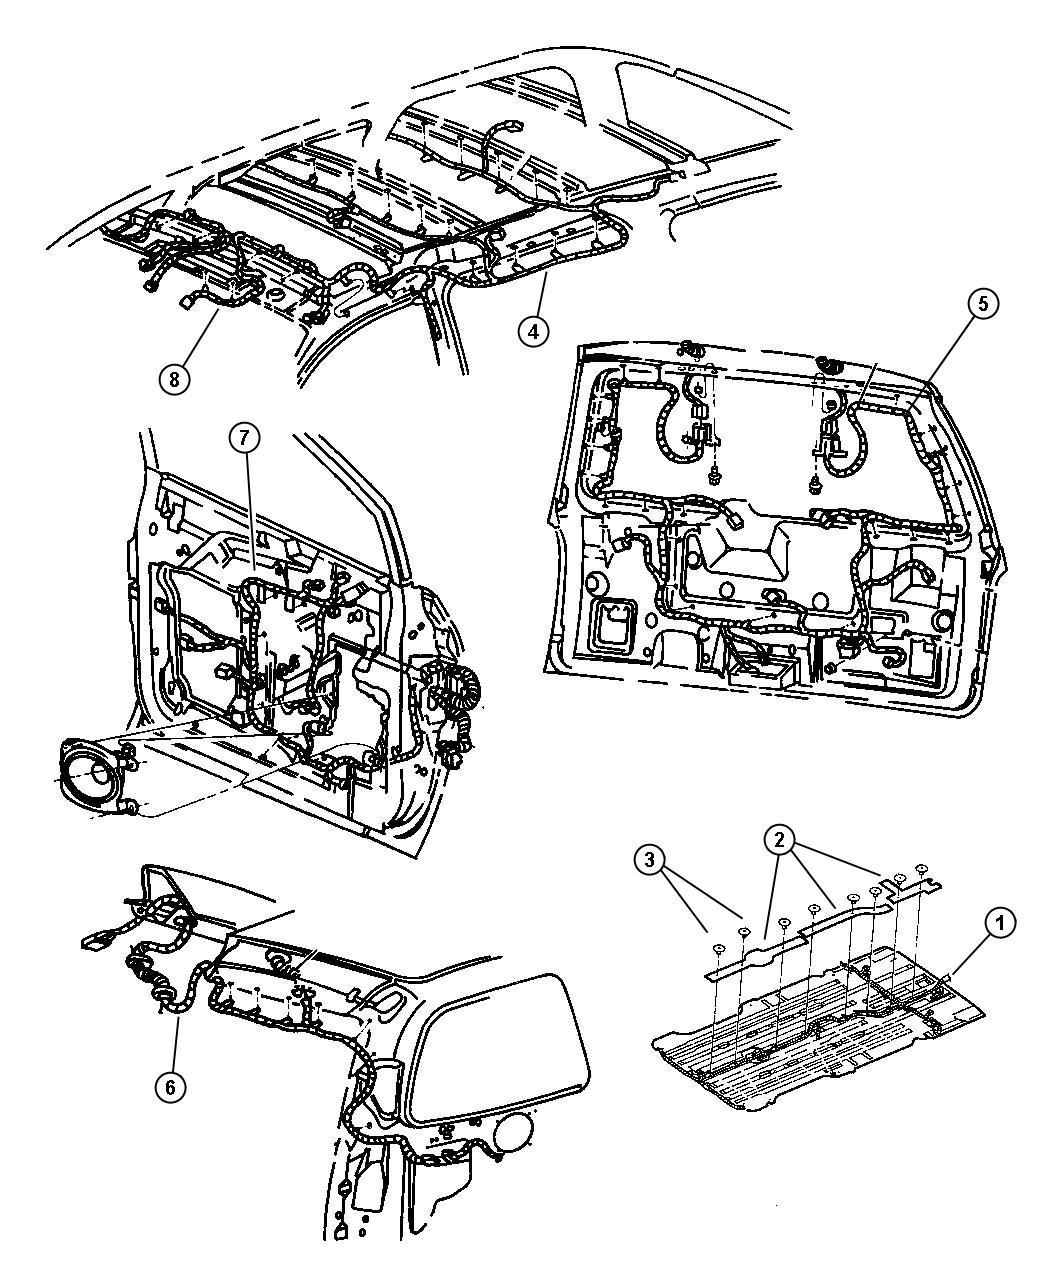 Dodge Grand Caravan Harness Wiring Air Conditioning